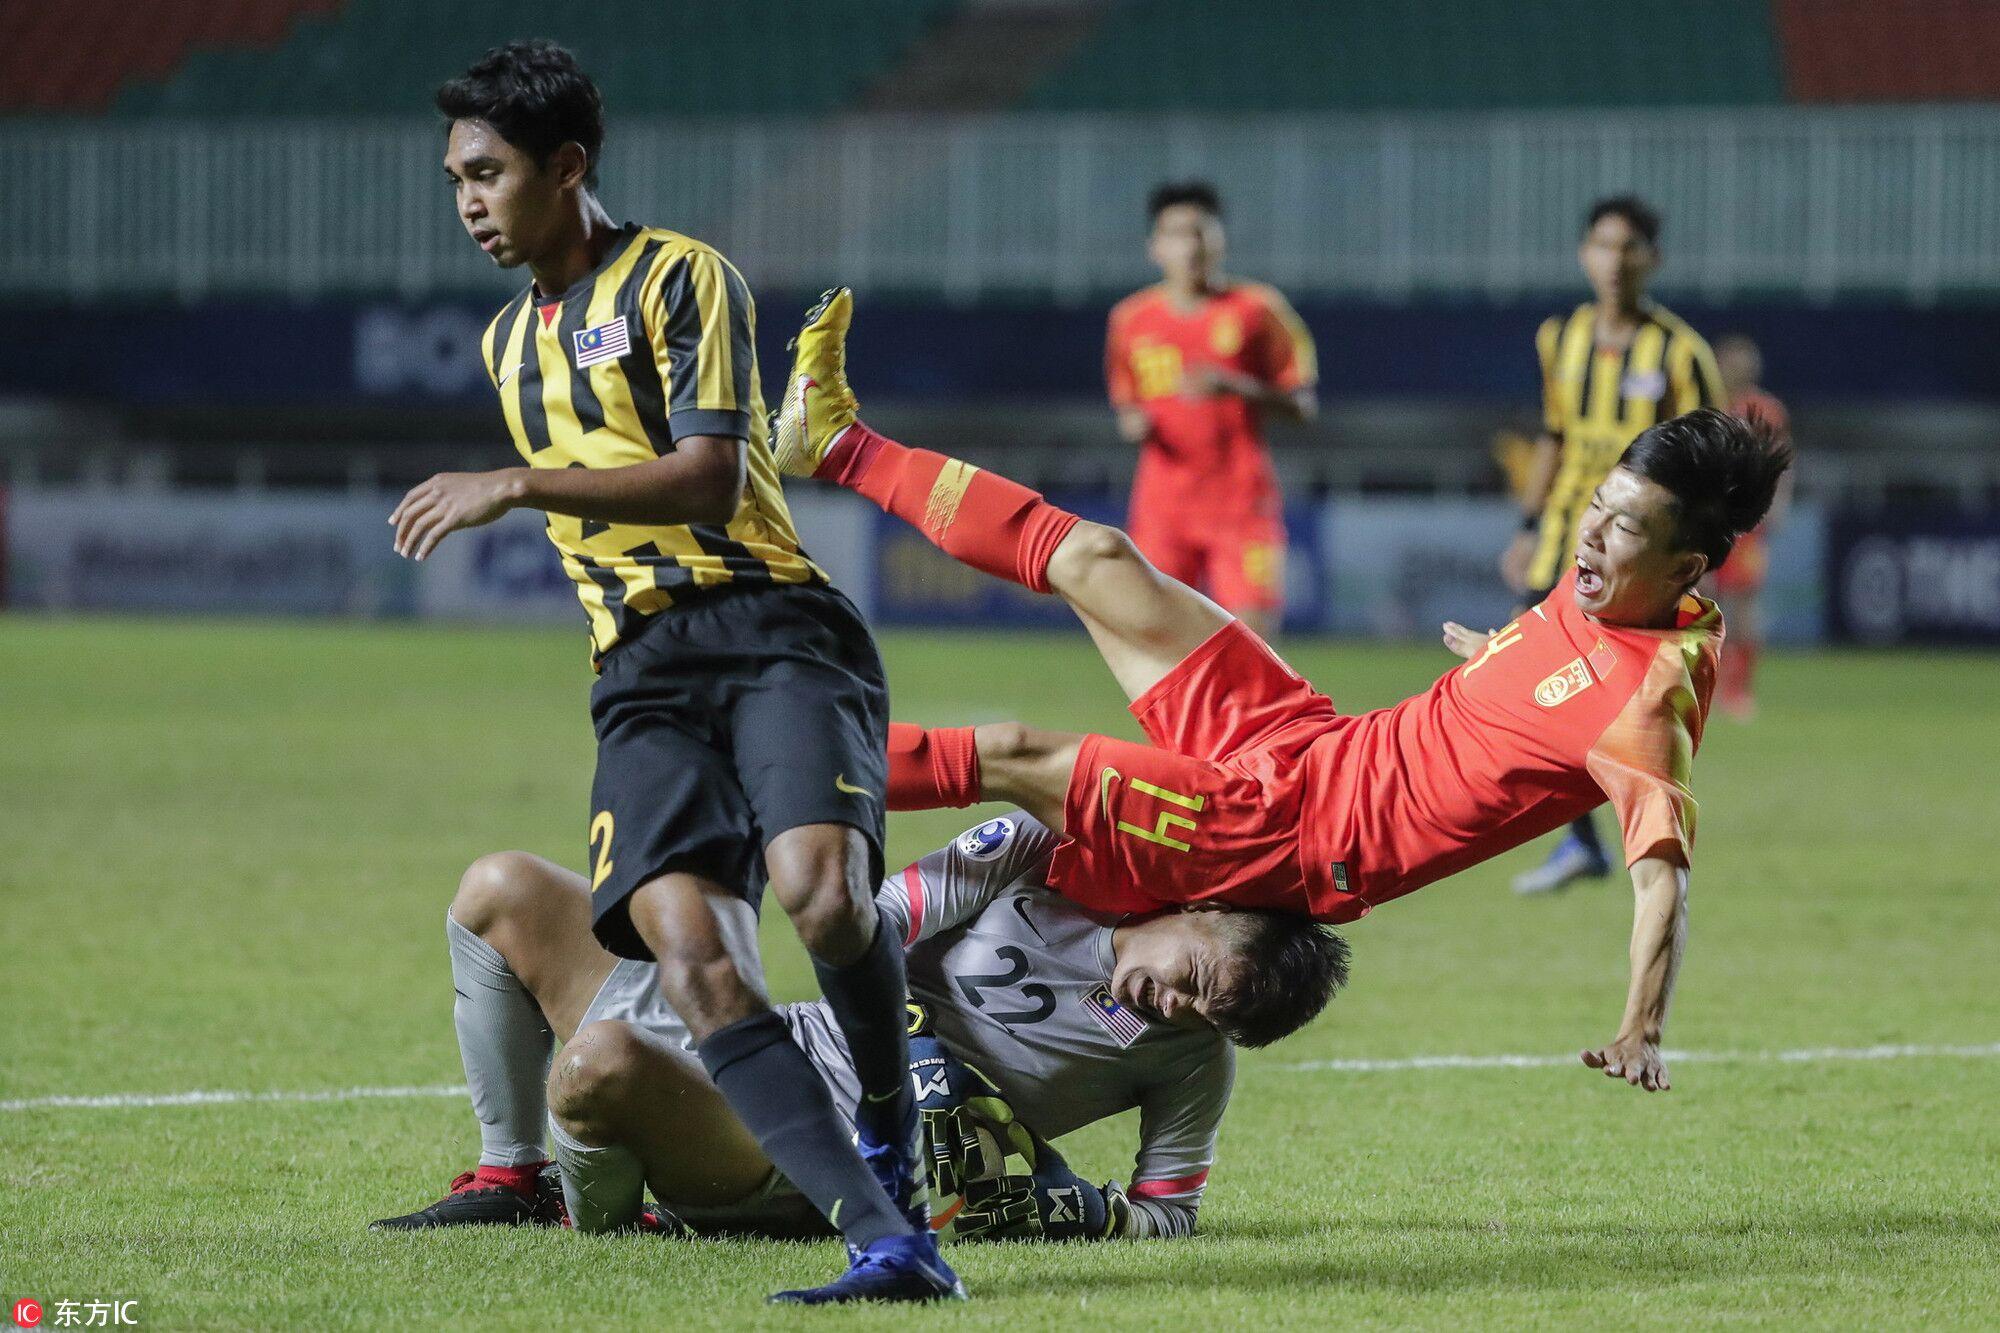 U19亚青赛:陶强龙徐越破门,中国2-0马来西亚